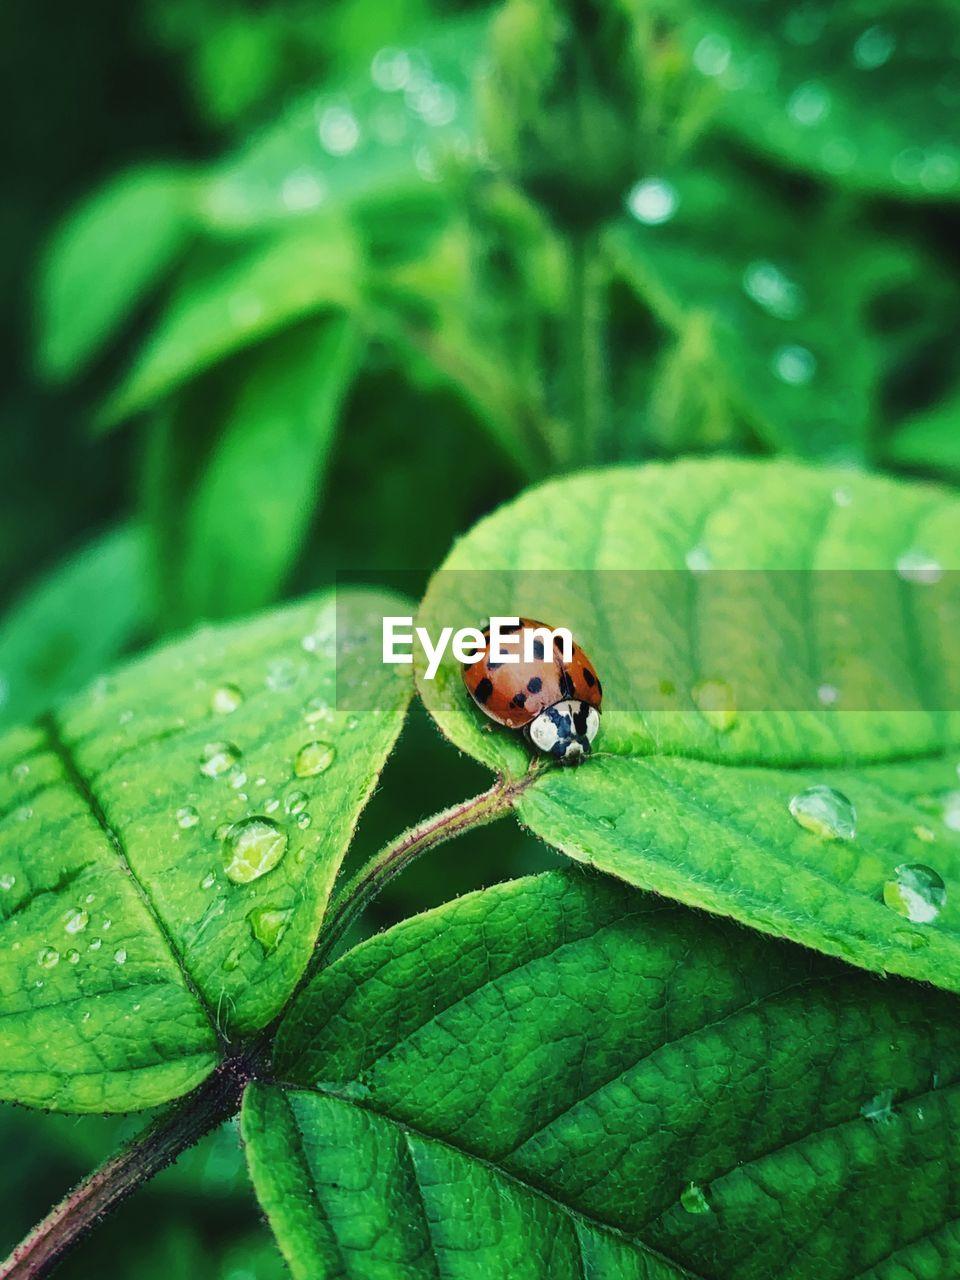 Close-up of ladybug on a rose bush leaf